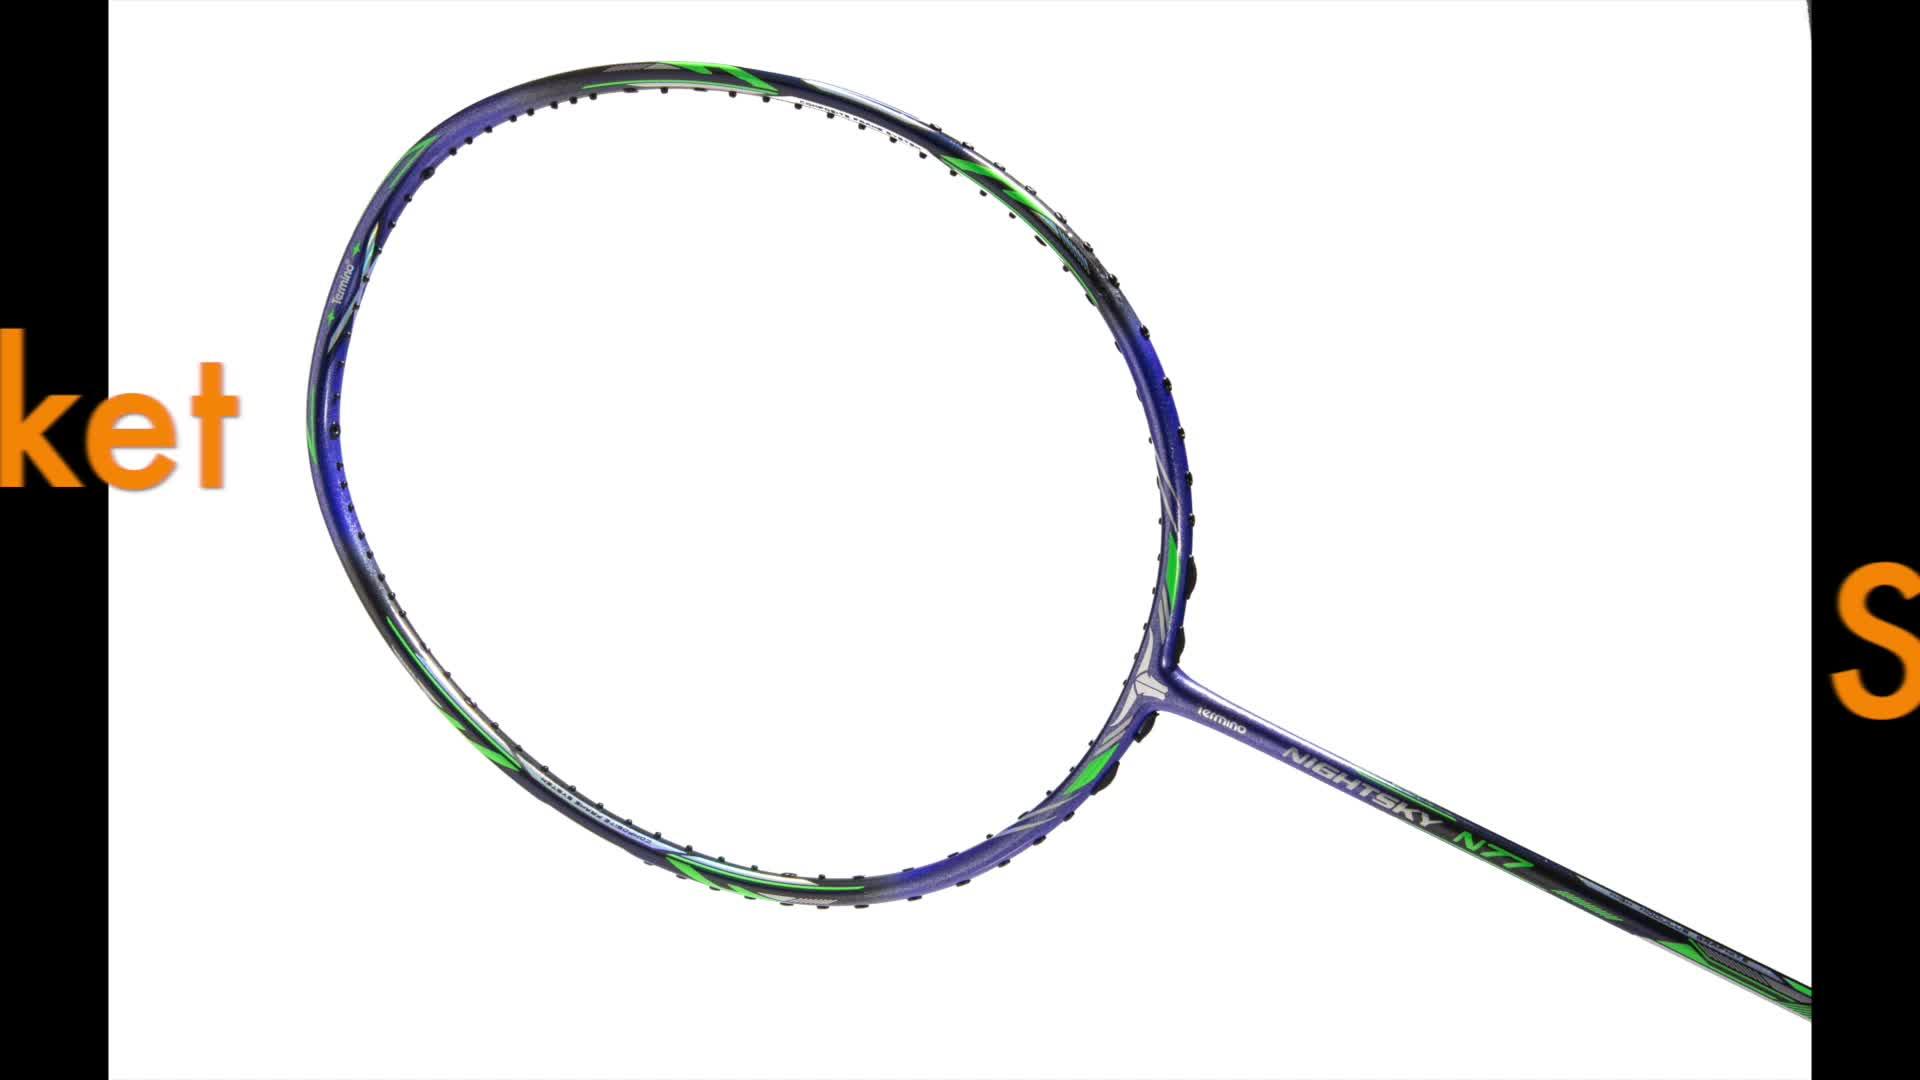 Extreem licht 58g 9U 30lbs max spanning G5 professionele hoge modulus carbon fiber badminton racket